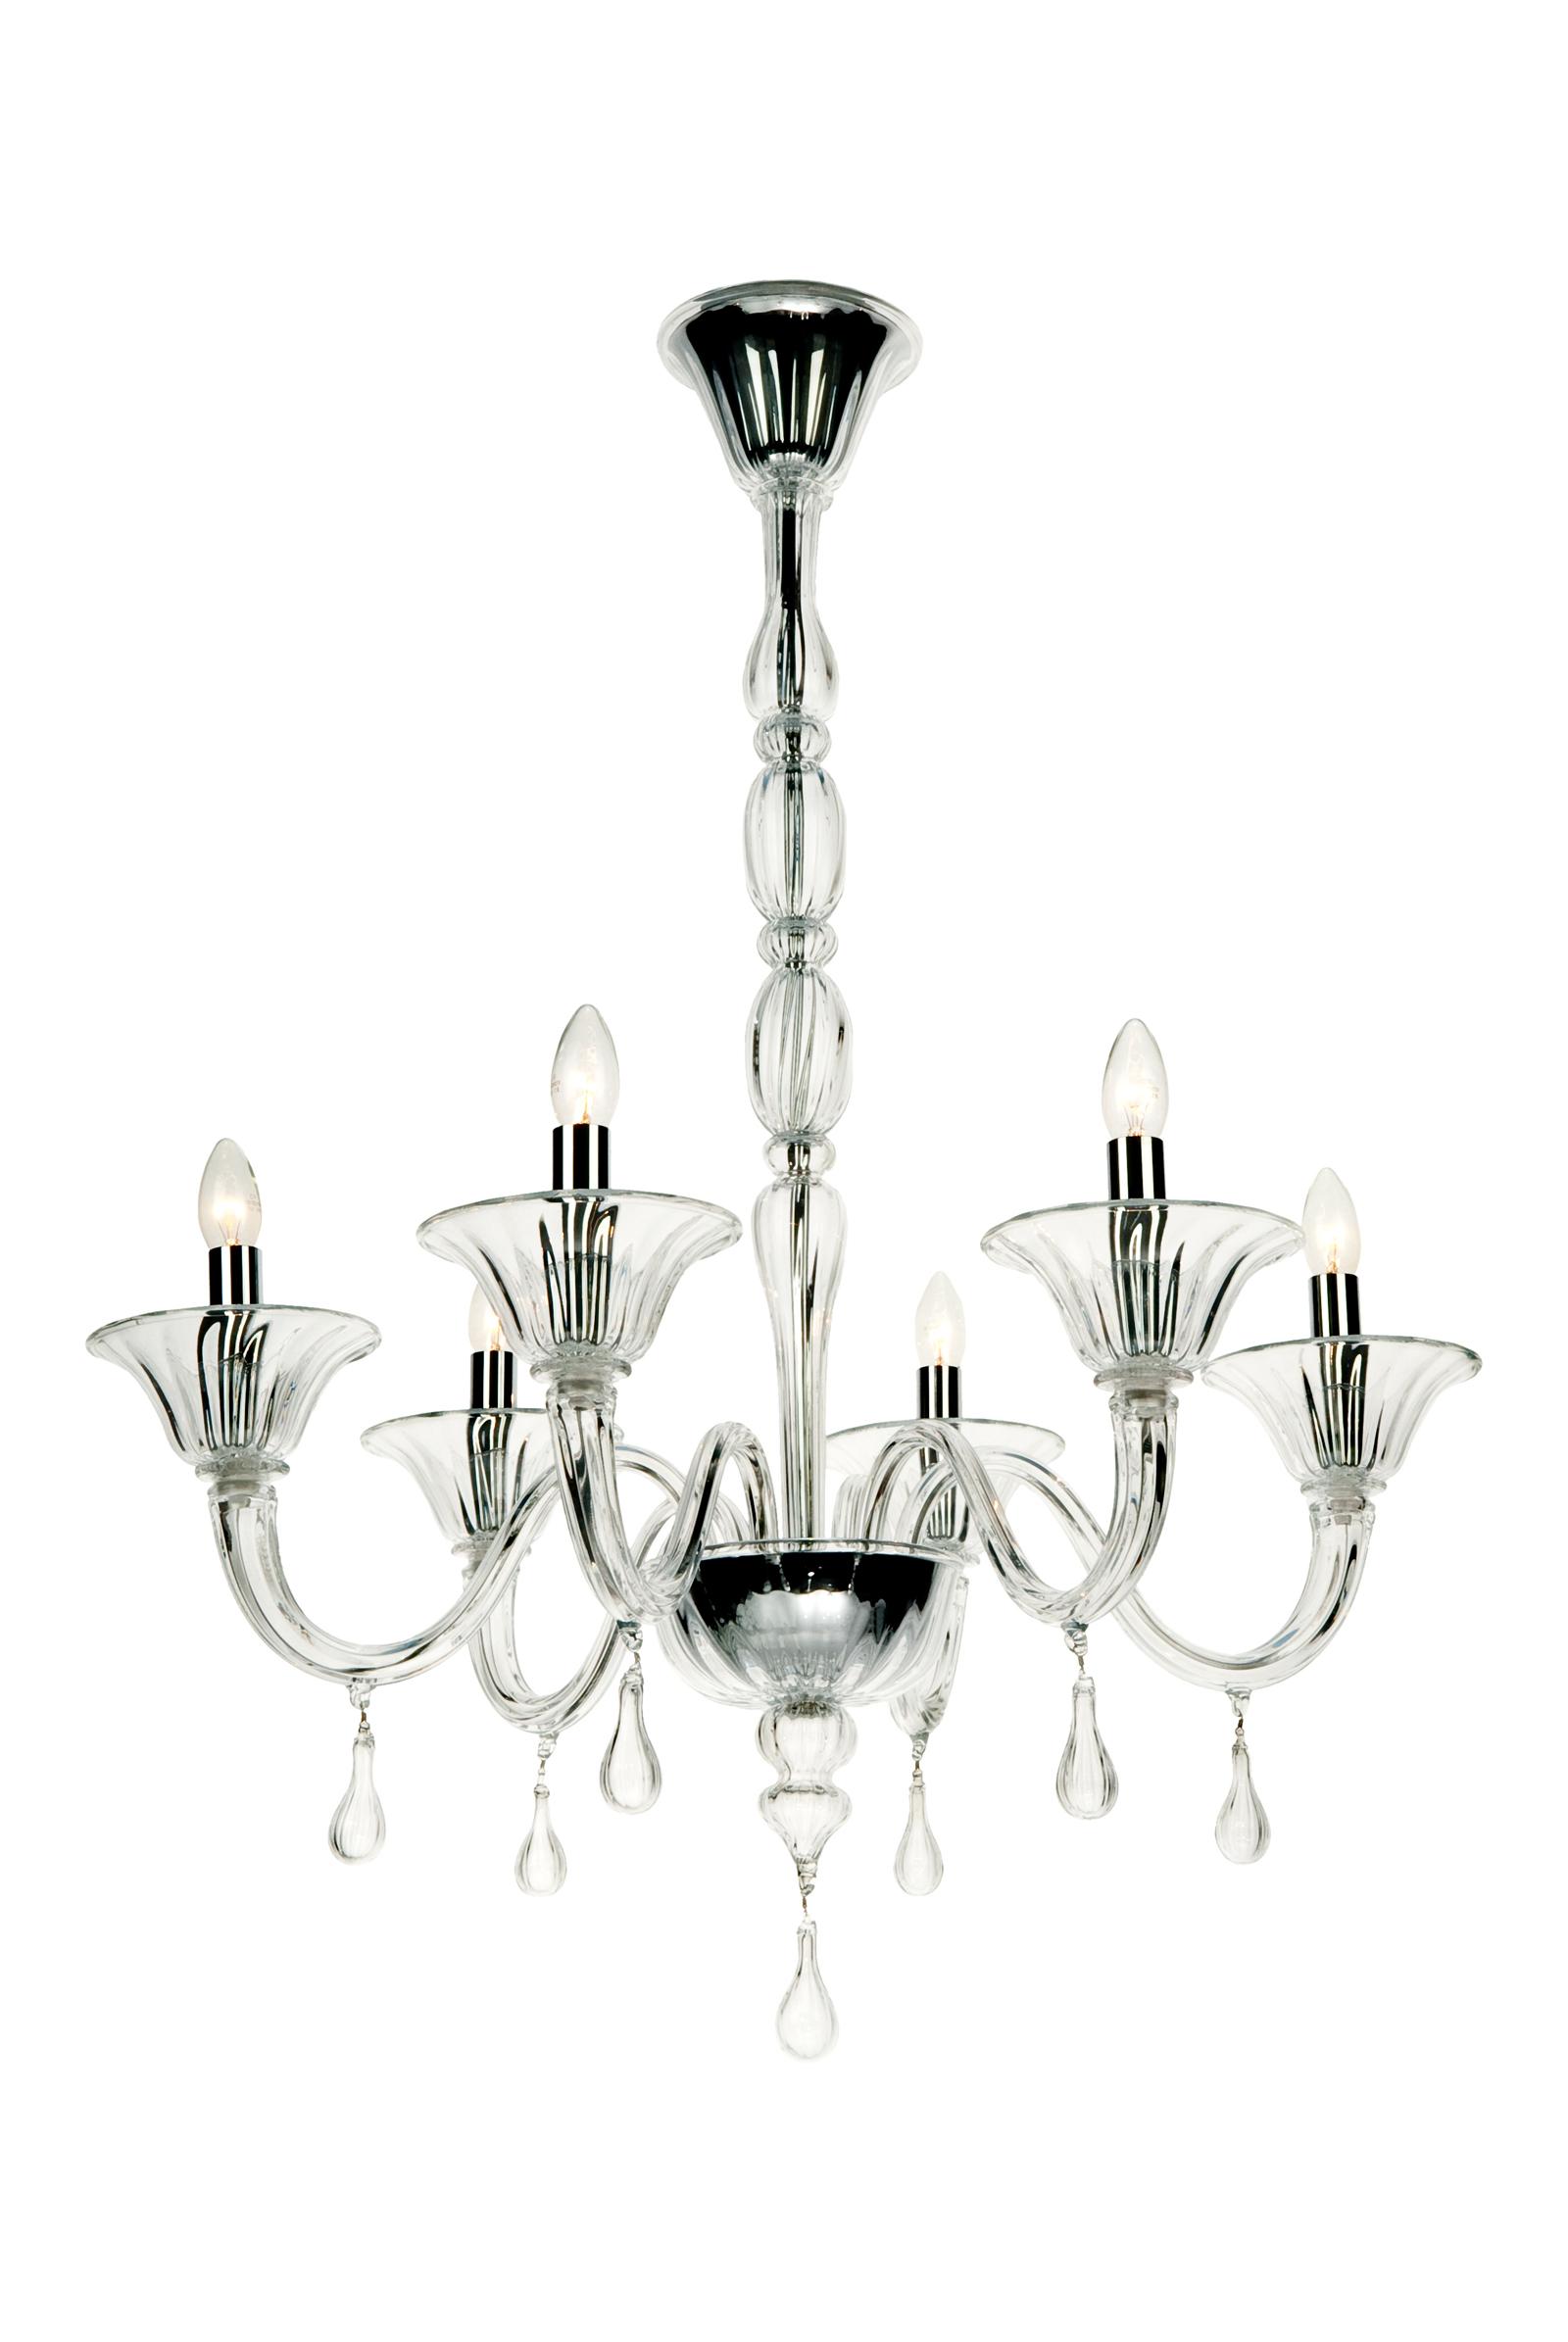 trentina-lustre-crystal-cristal-chandelier-veronese-11.jpg